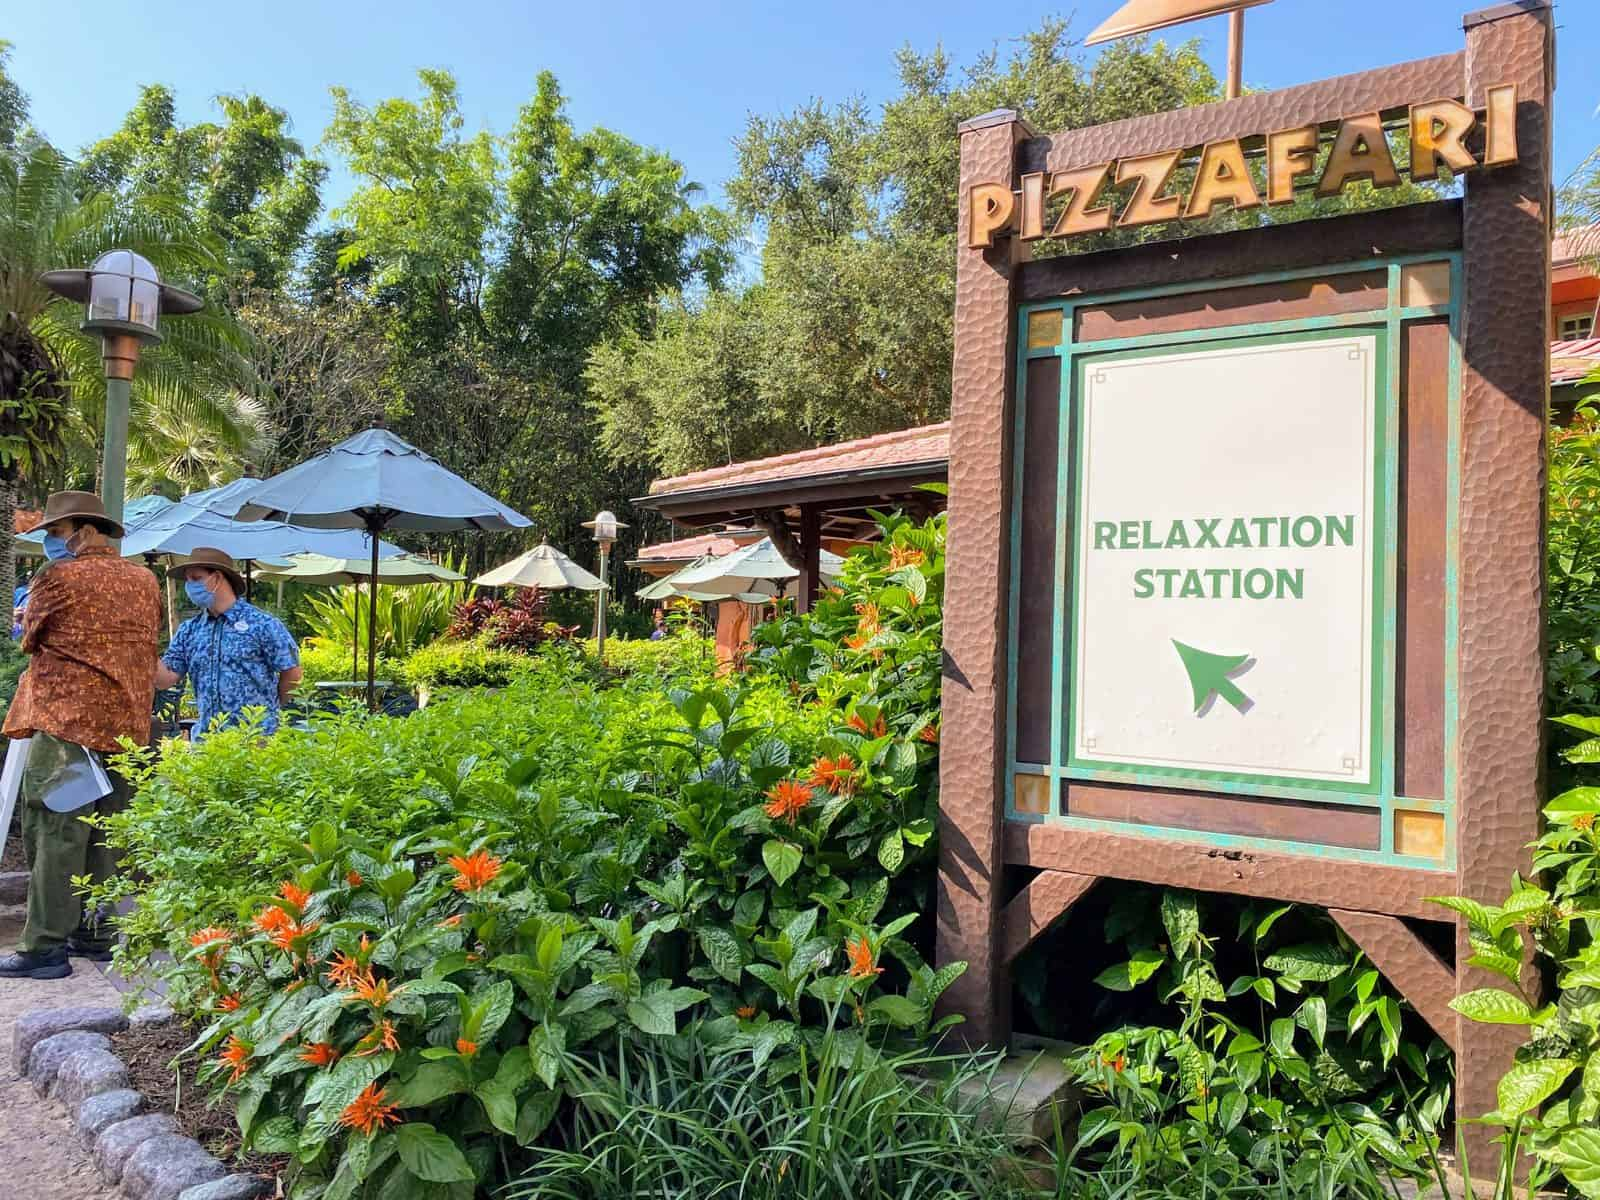 Animal Kingdom Relaxation Station